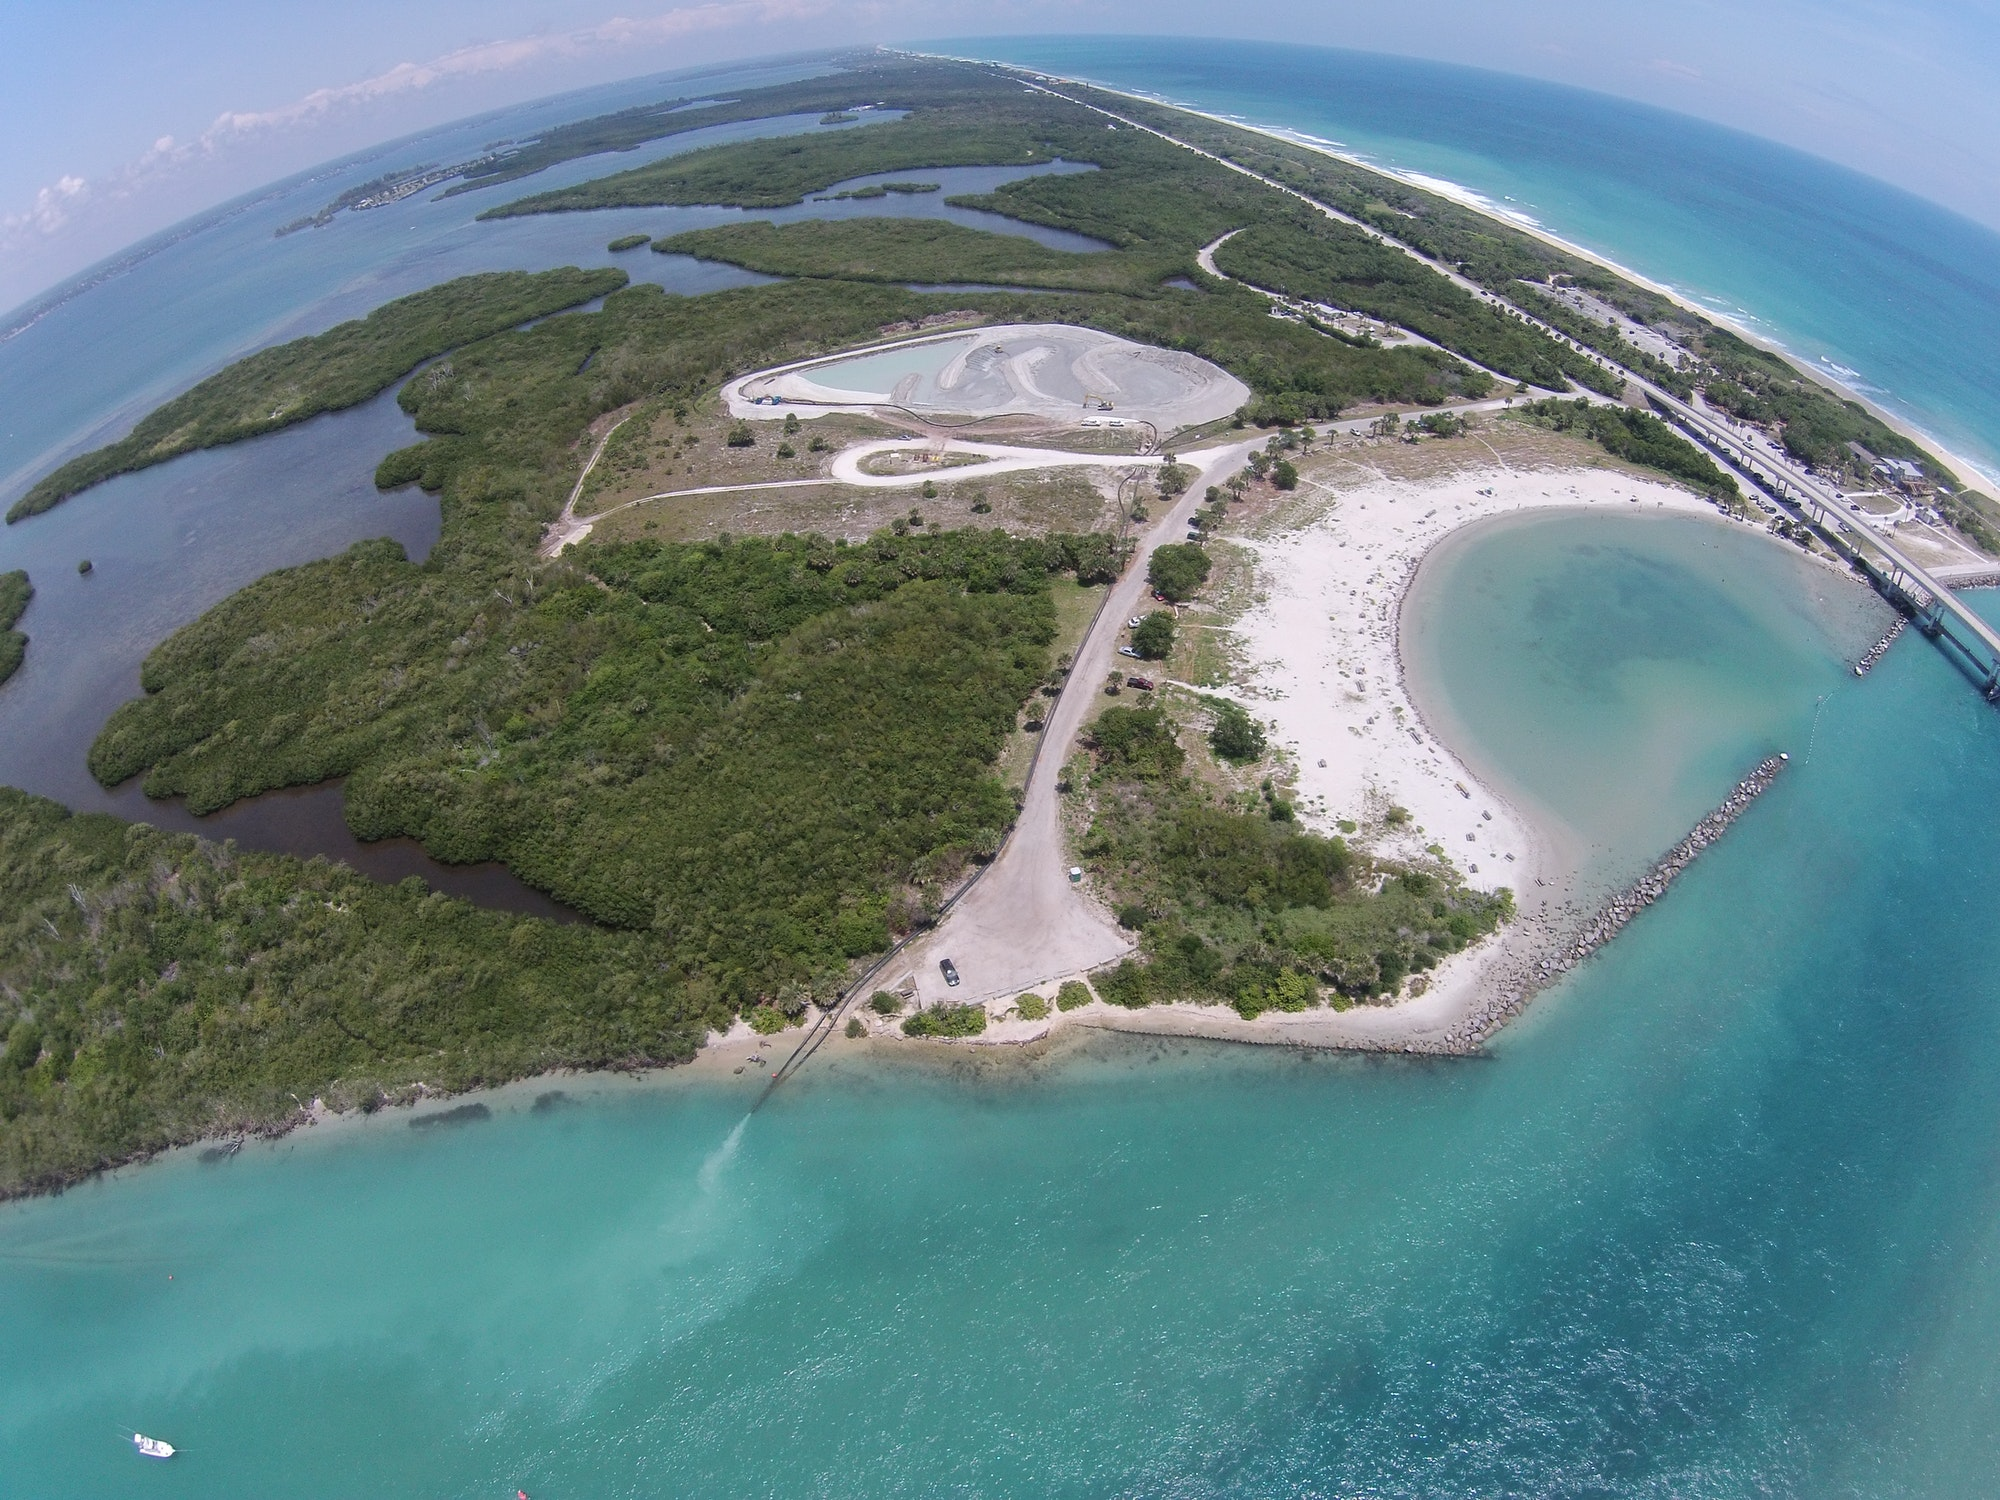 aerial view of tide pool looking North